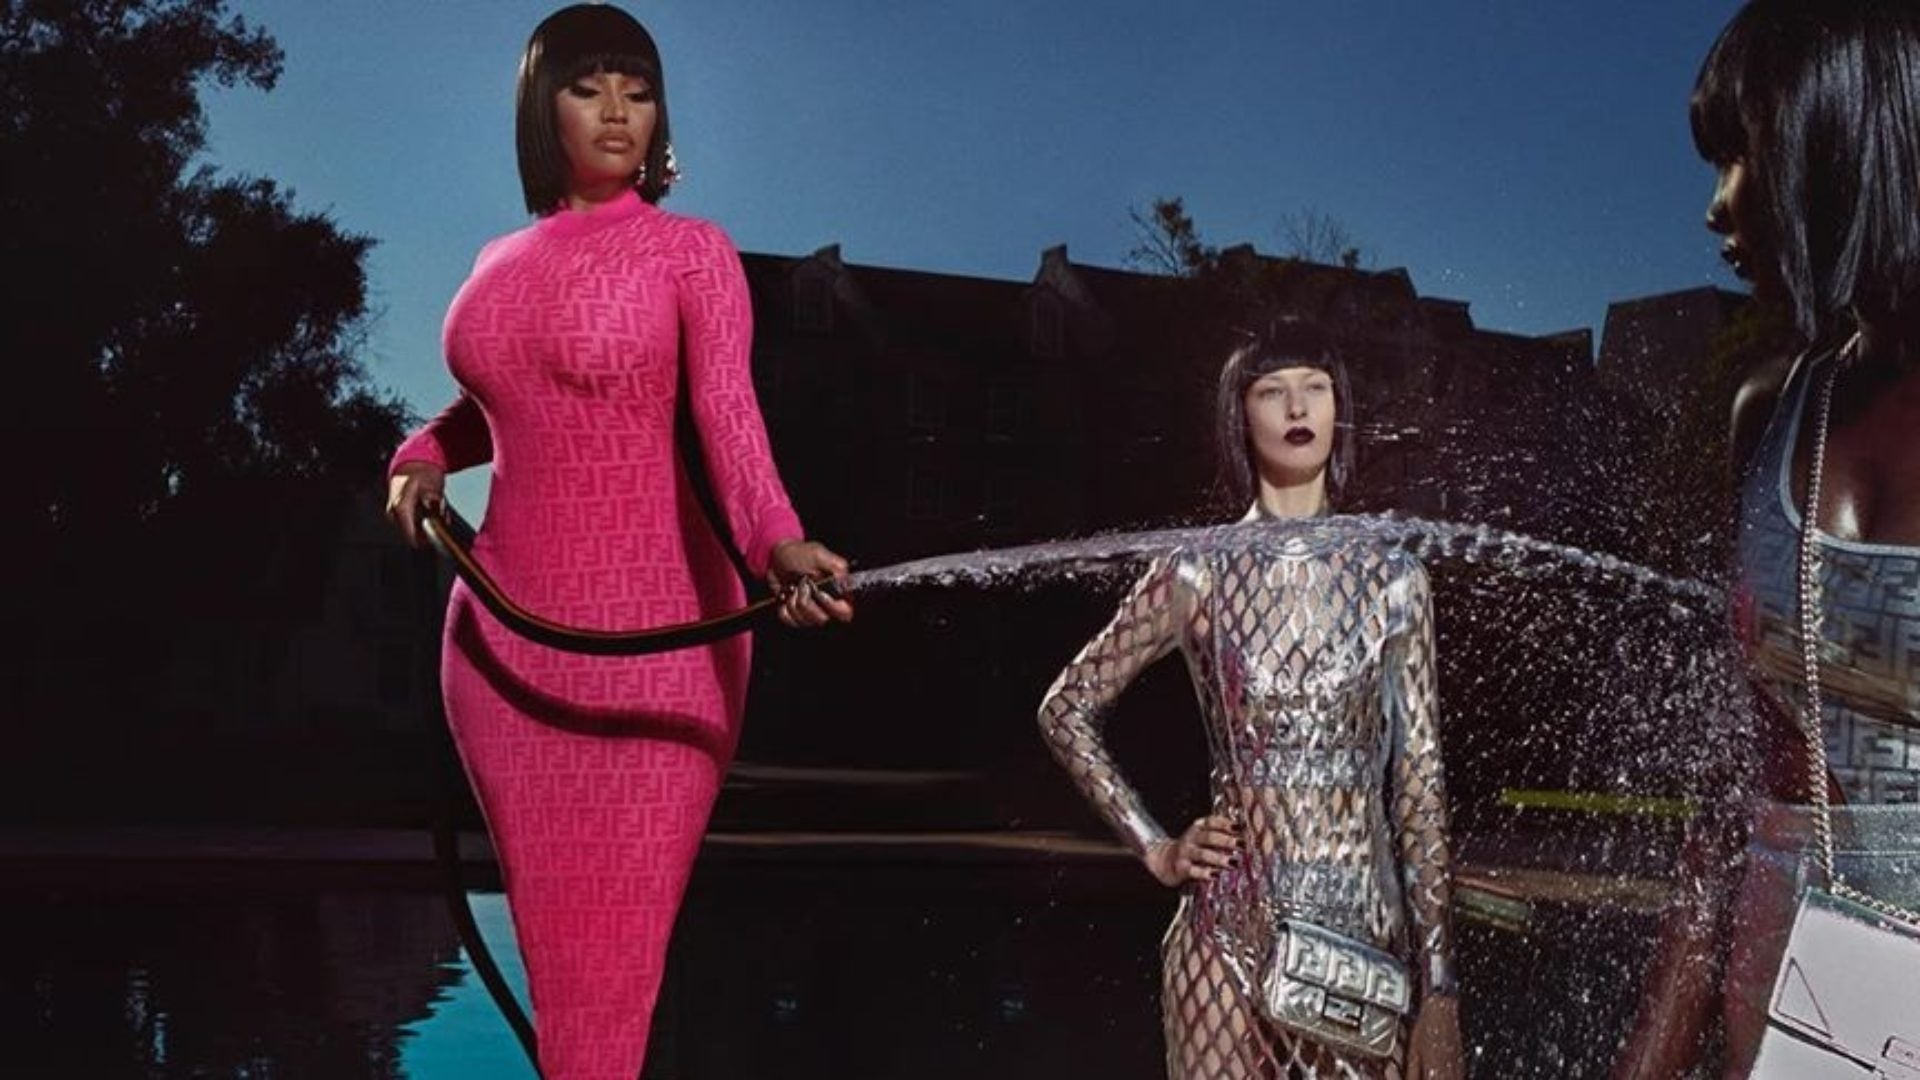 Our Favorite Picks From The Nicki Minaj And Fendi Collaboration